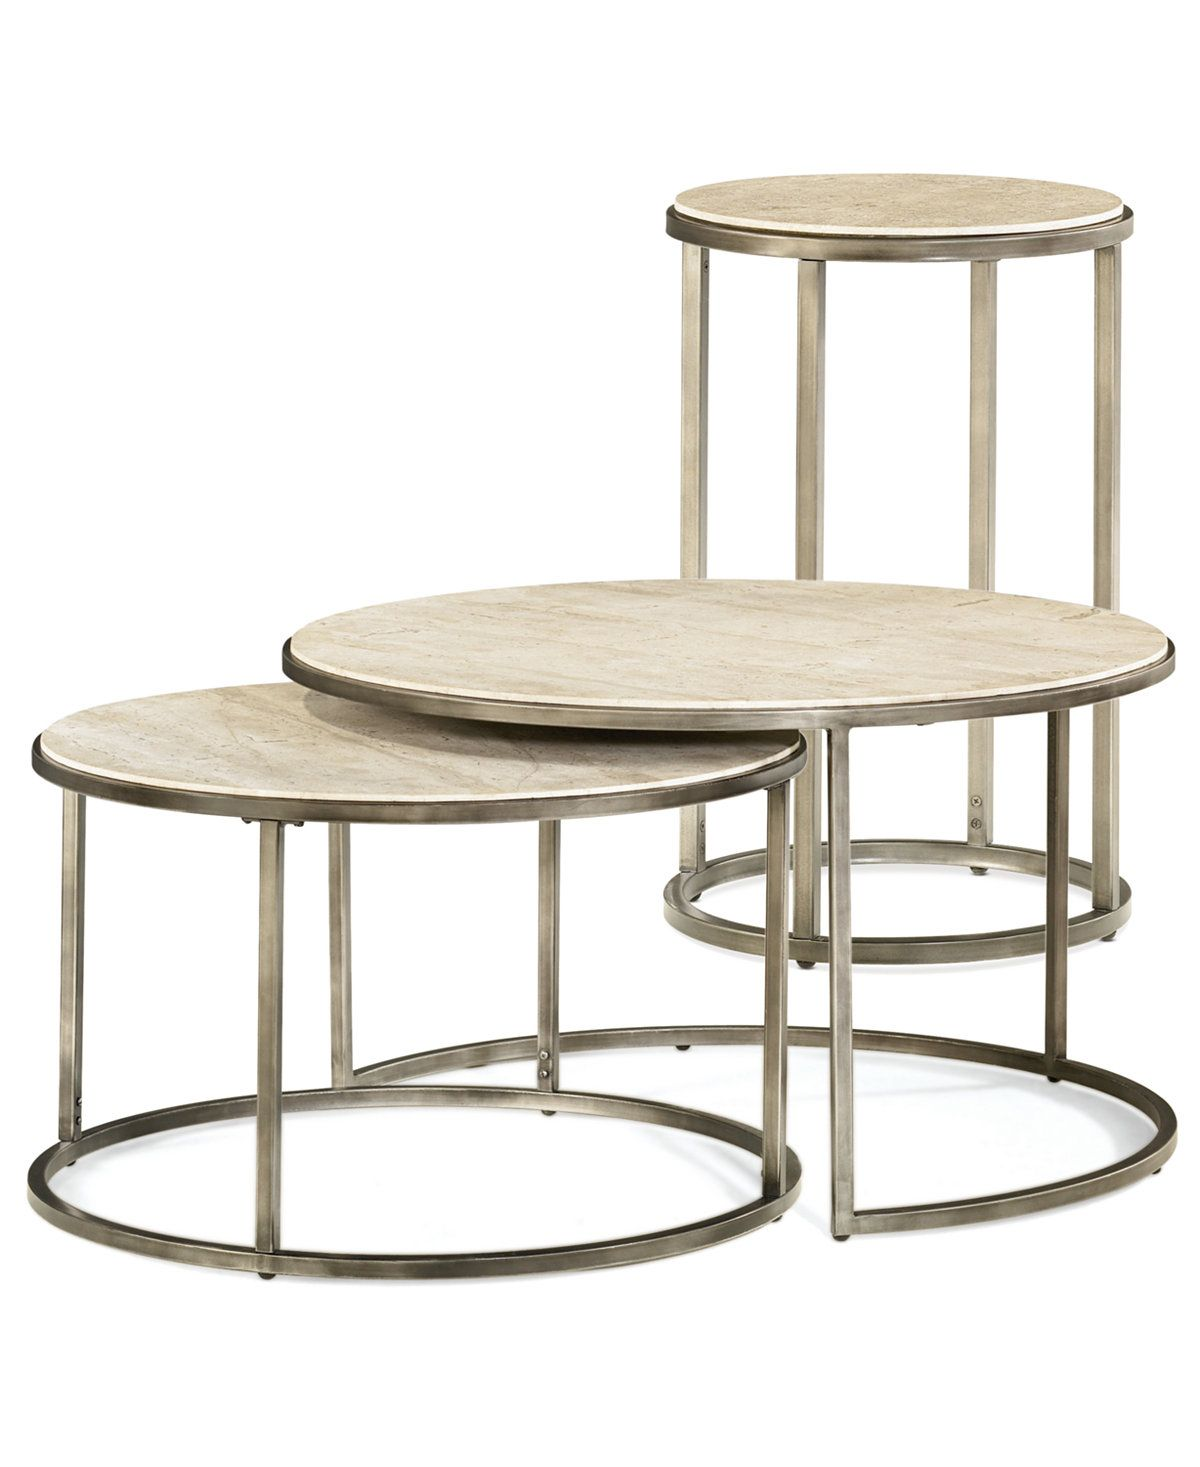 Monterey Round Tables 2 Piece Set Nesting Coffee Table And End Table Coffee Accent Tables Furni Nesting Coffee Tables Bronze Coffee Table Coffee Table [ 1467 x 1200 Pixel ]